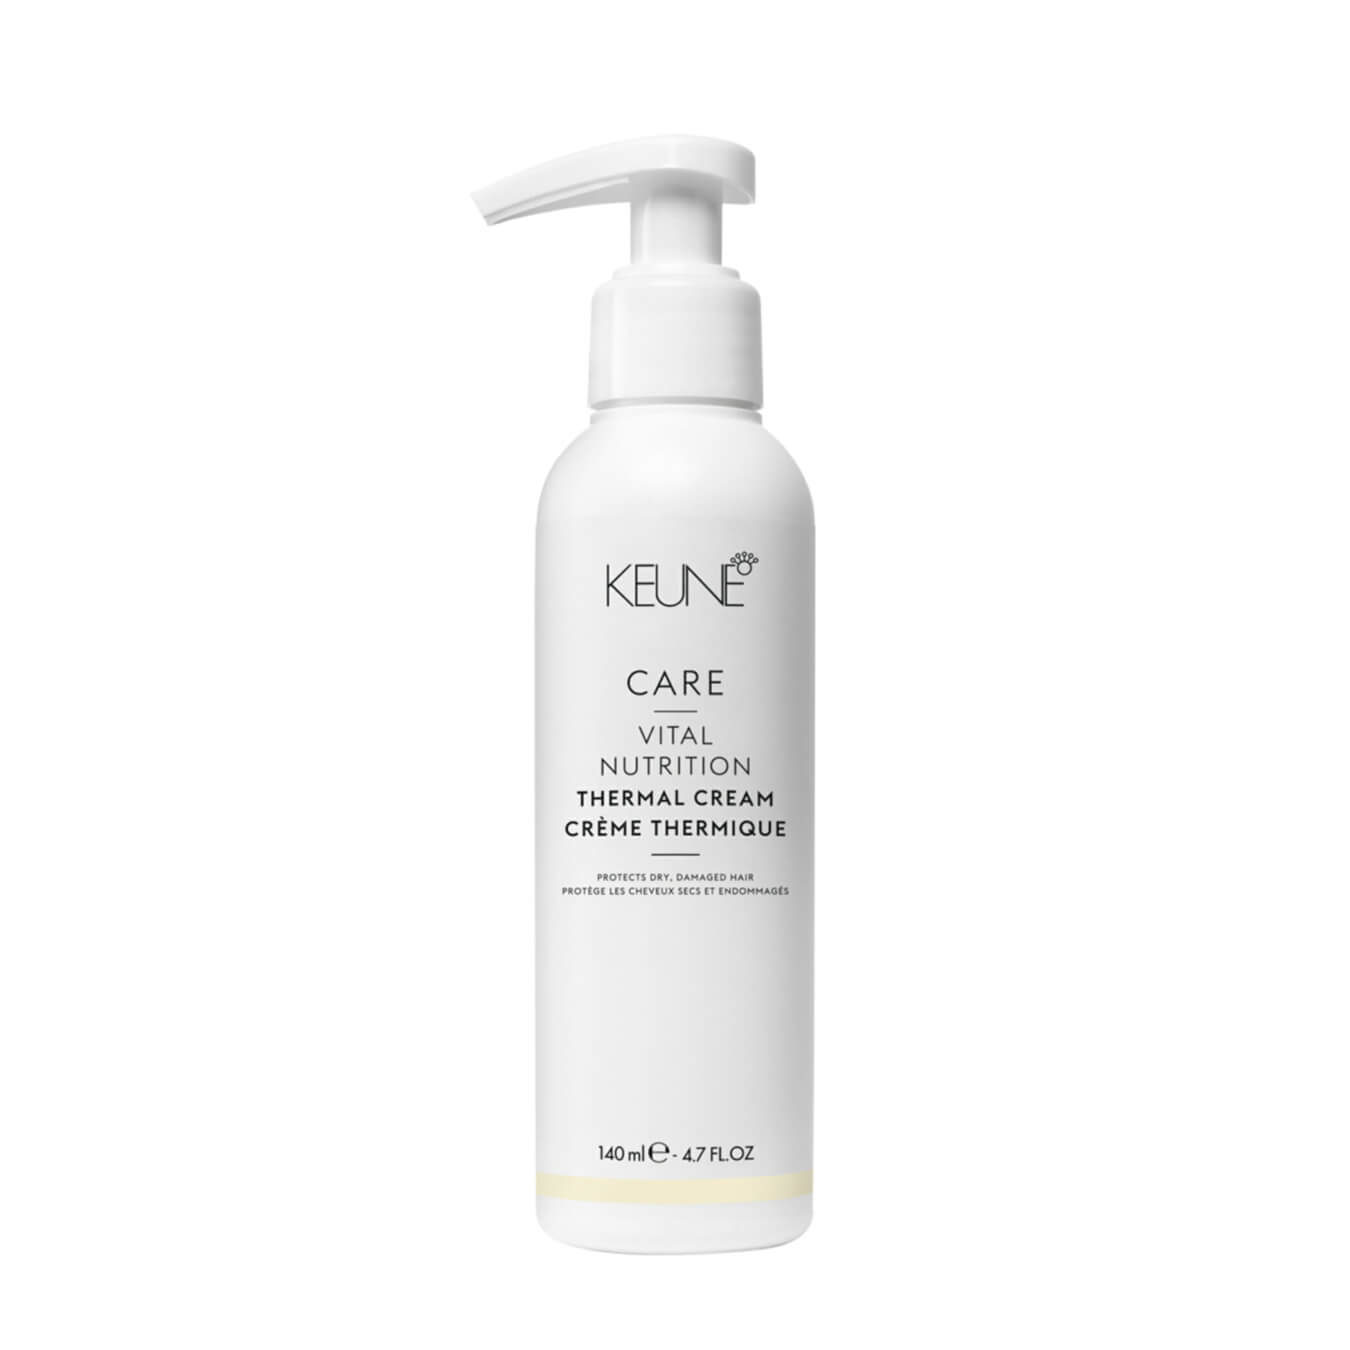 Kauf Keune Care Vital Nutrition Thermal Cream 140ml